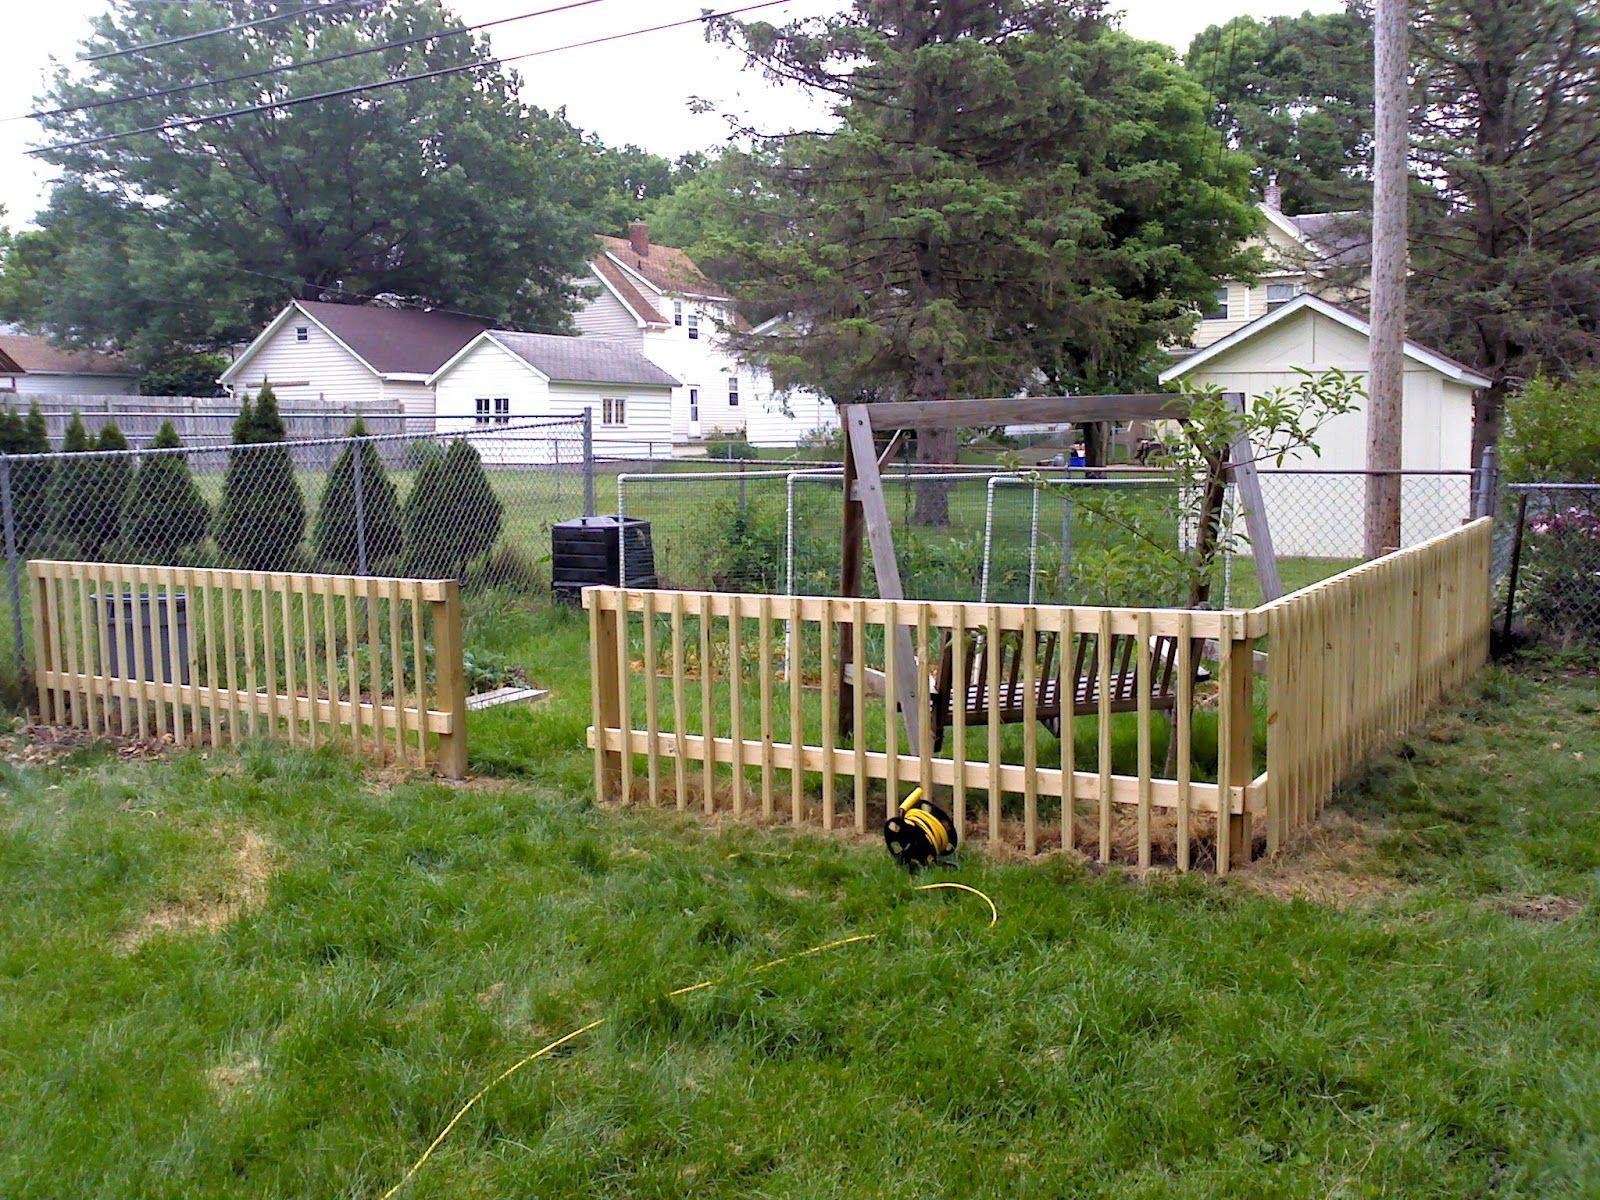 20.SIMPHOME.COM A wood fence ideas for backyard colors for your home DIY garden